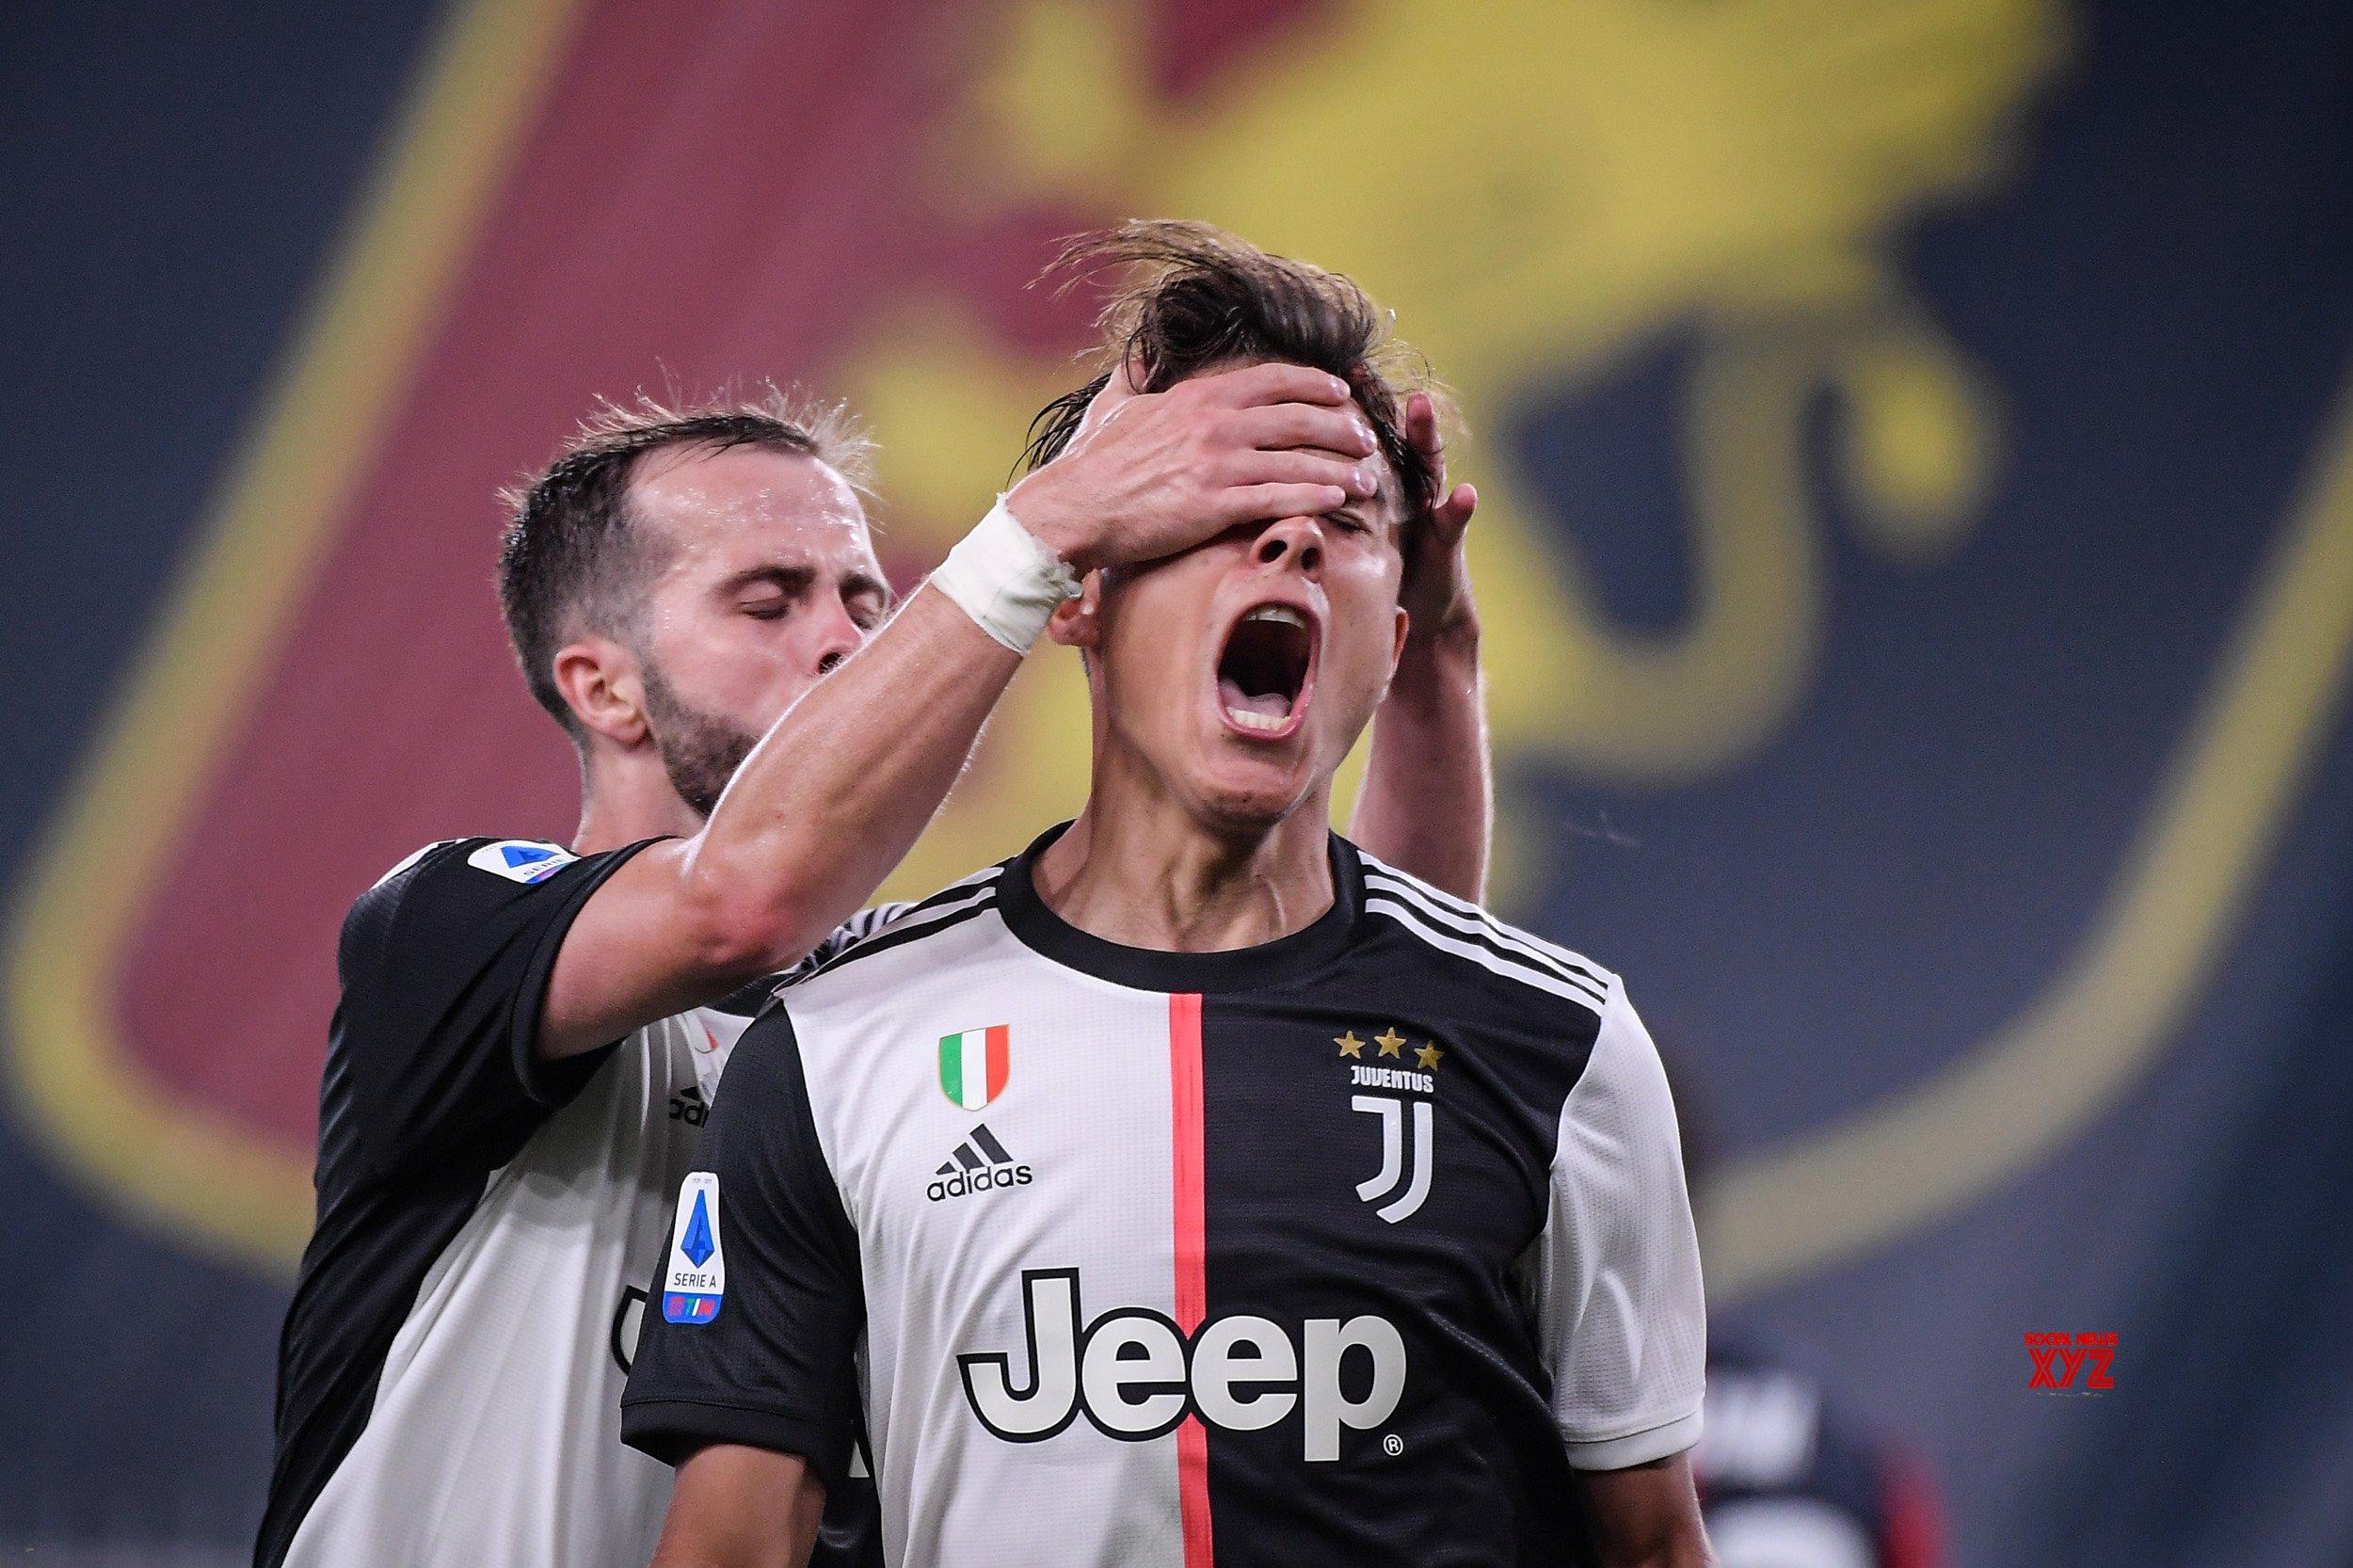 ITALY - GENOVA - FOOTBALL - SERIE A - GENOA VS JUVENTUS #Gallery